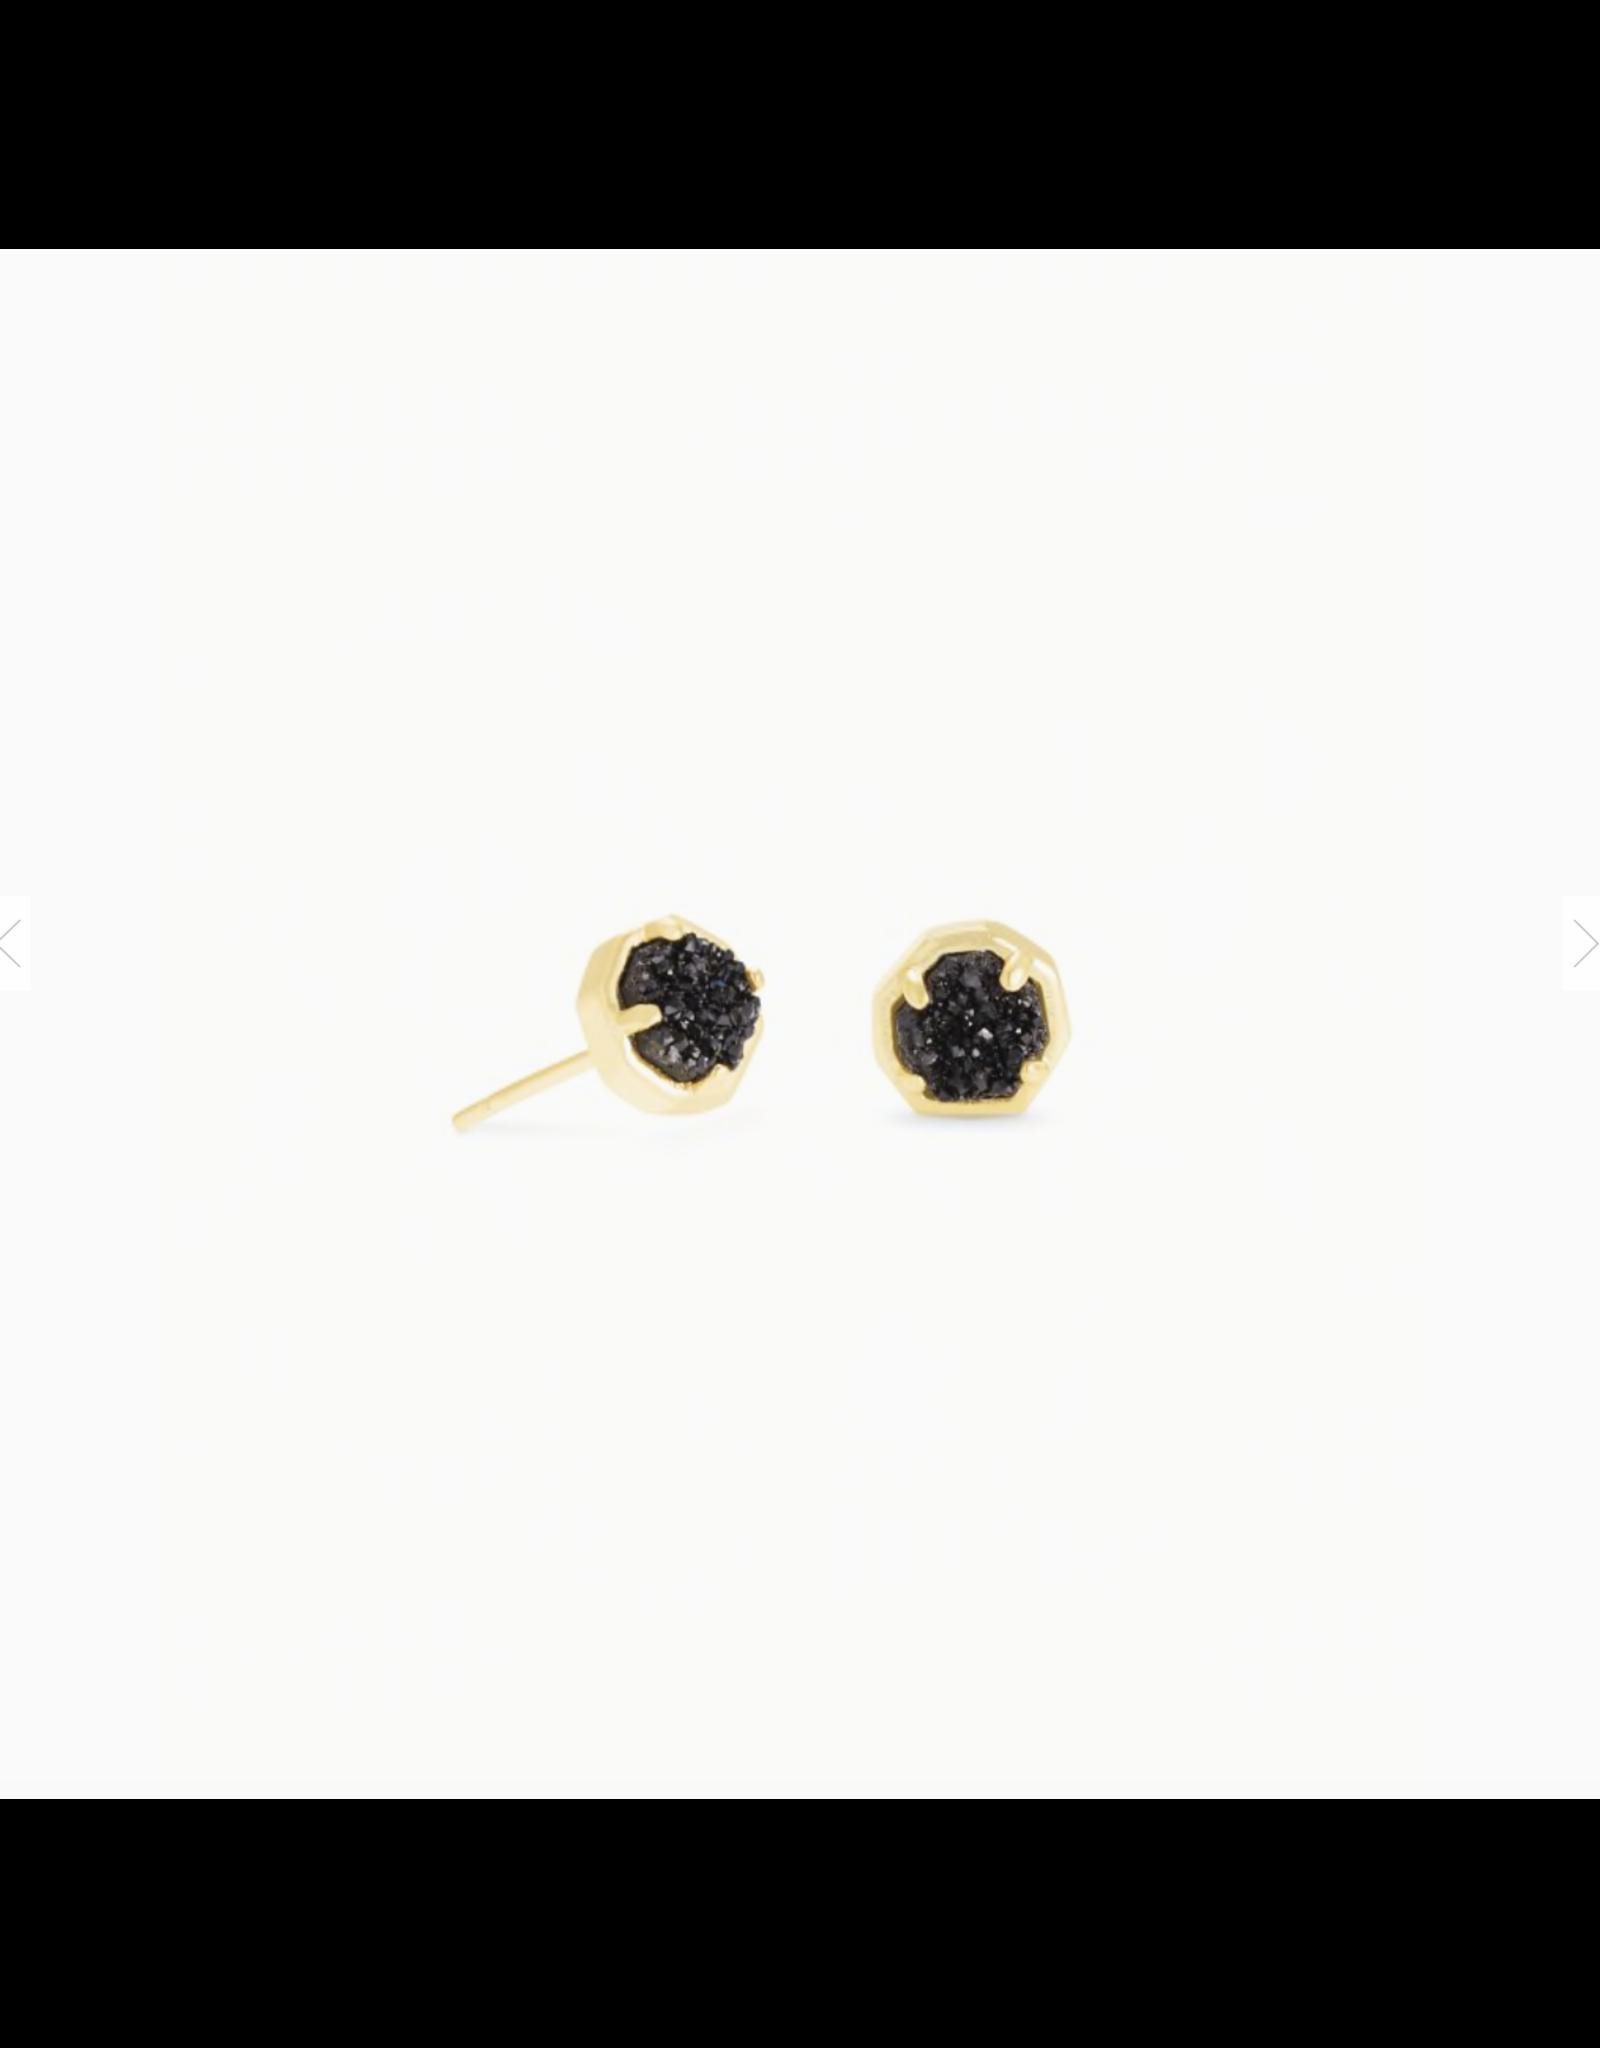 Kendra Scott Earring Nola Stud Gold Black Drusy